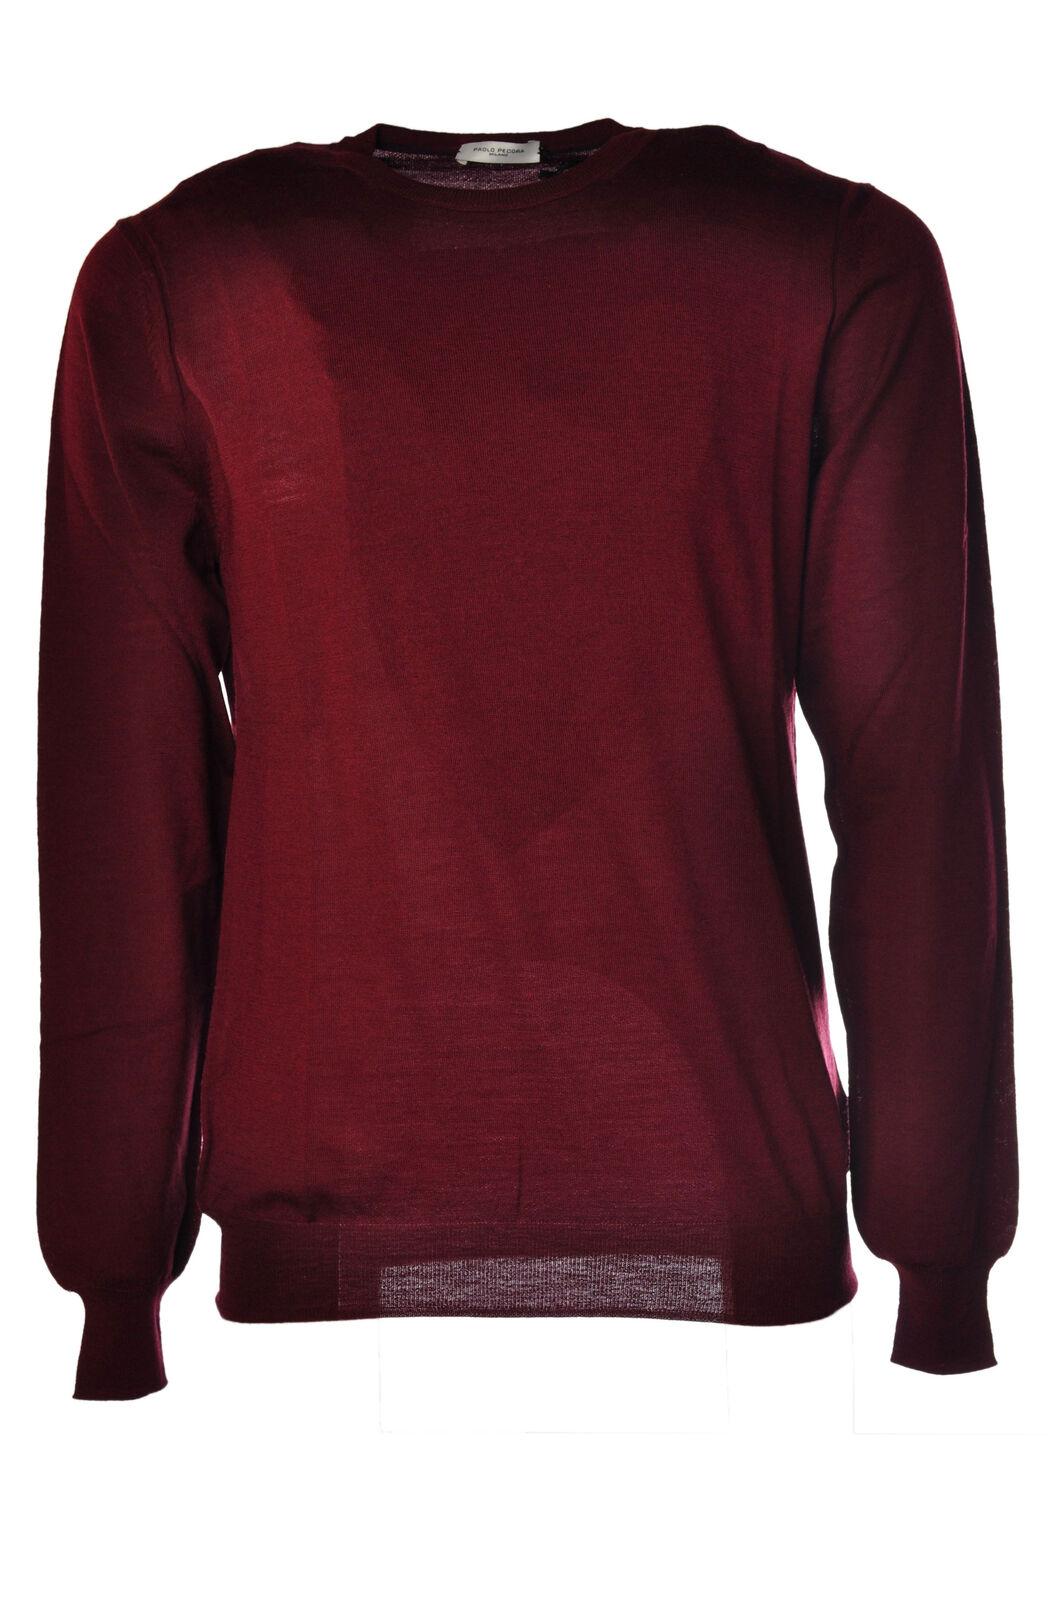 Paolo Pecora - Knitwear-Sweaters - Man - rot - 586315C183726